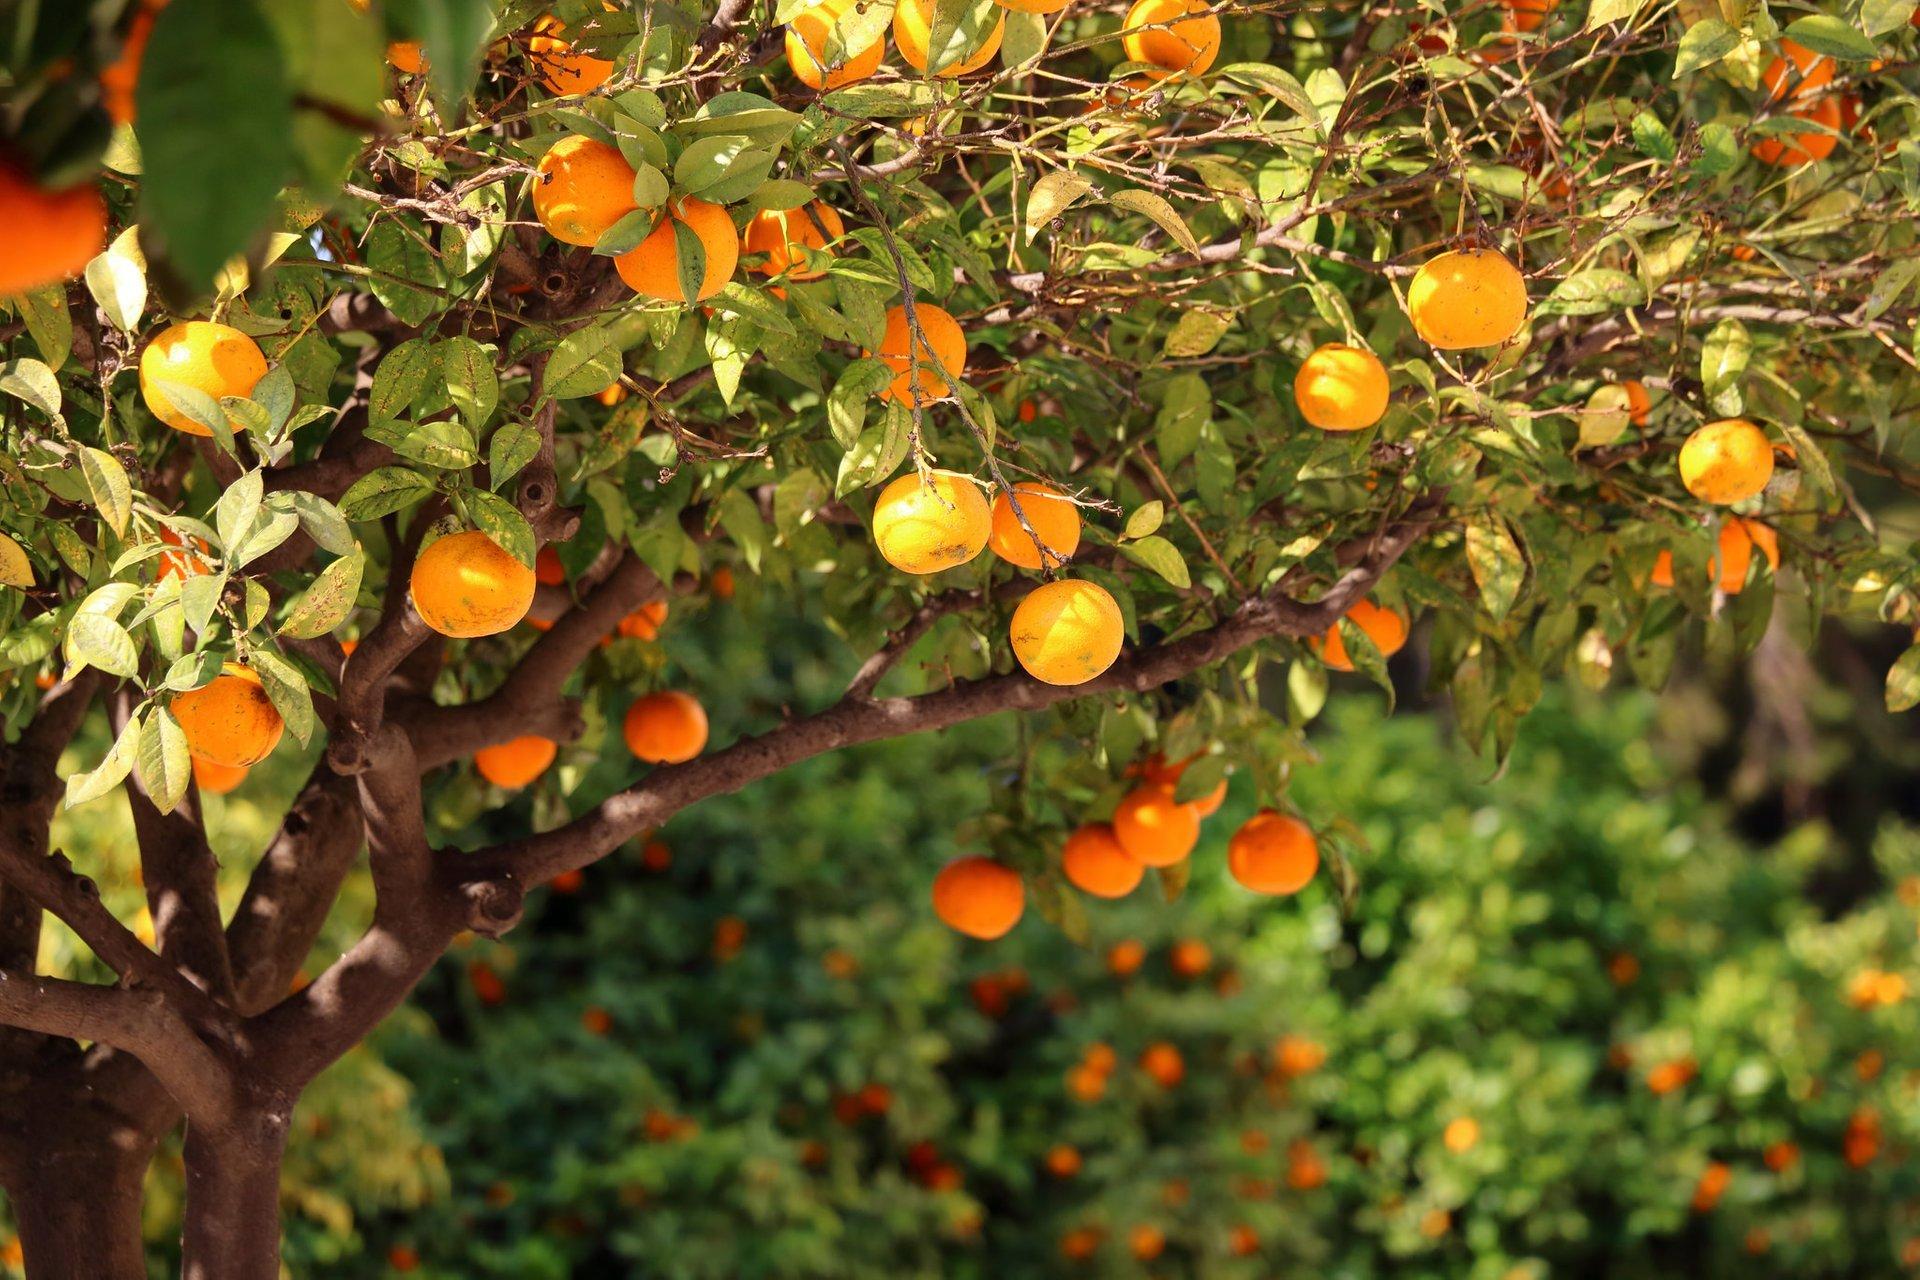 Oranges in Valencia 2019 - Best Time